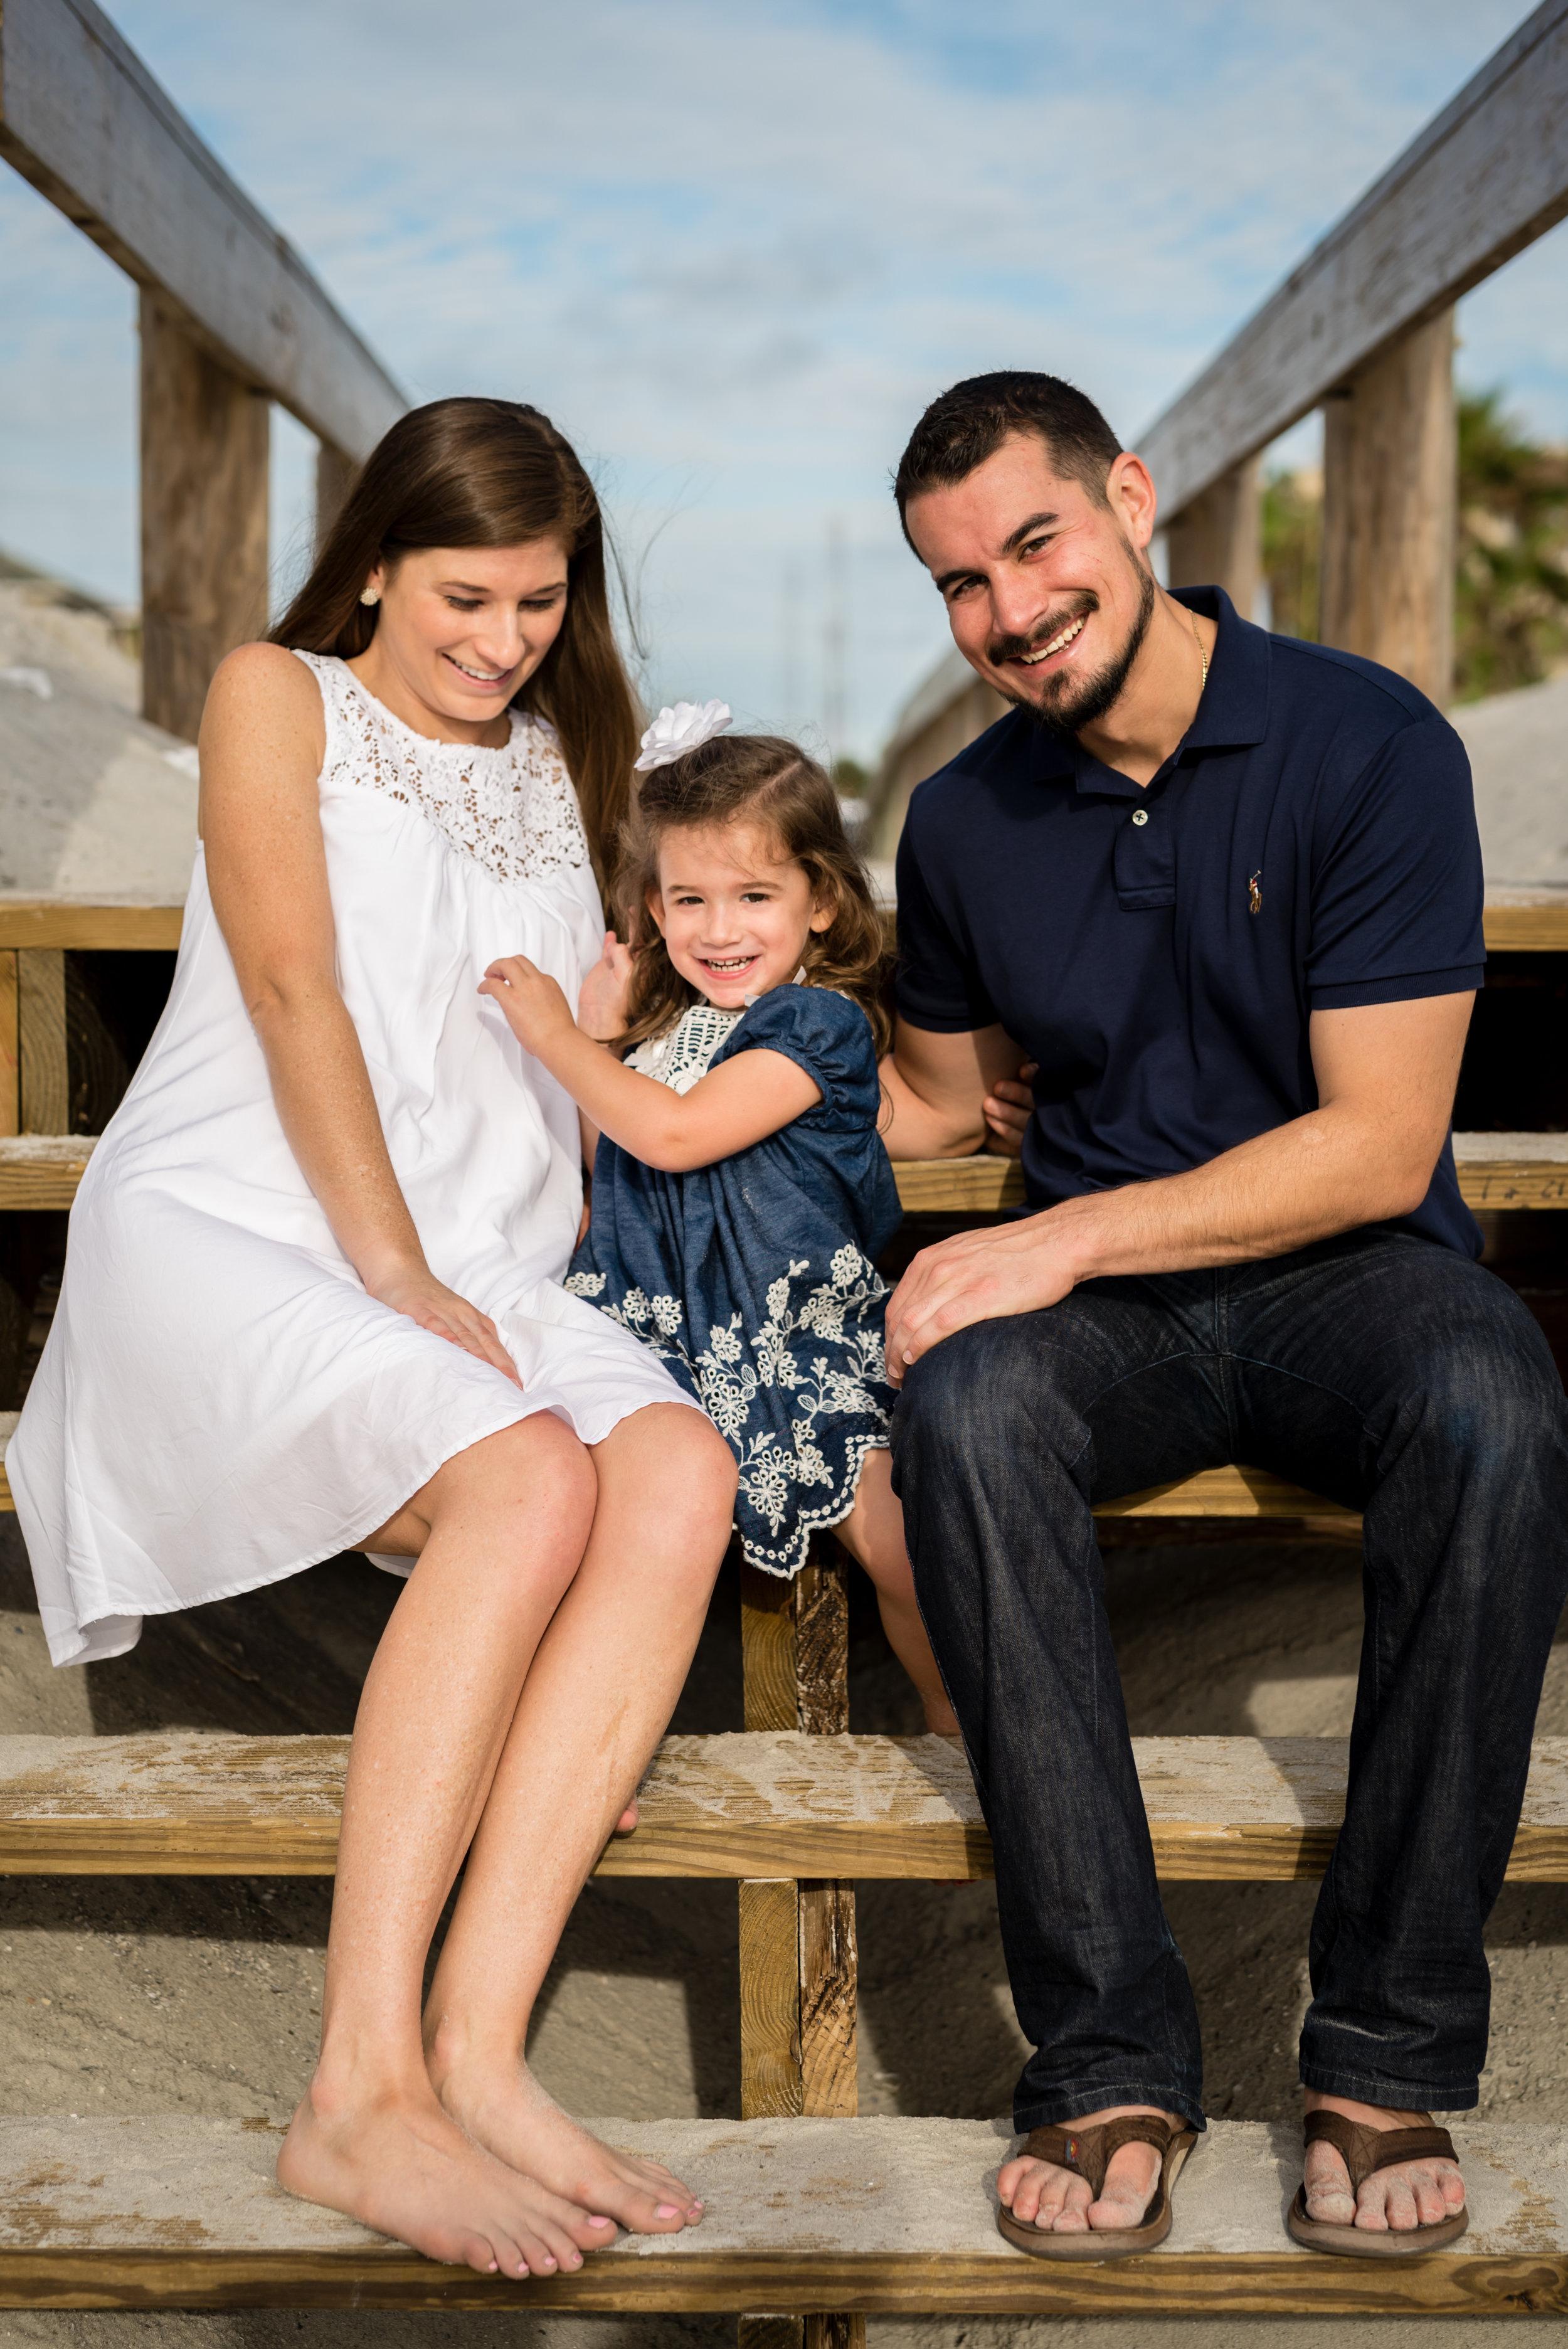 beachfamilyphotography-kristingroverimages4.jpg